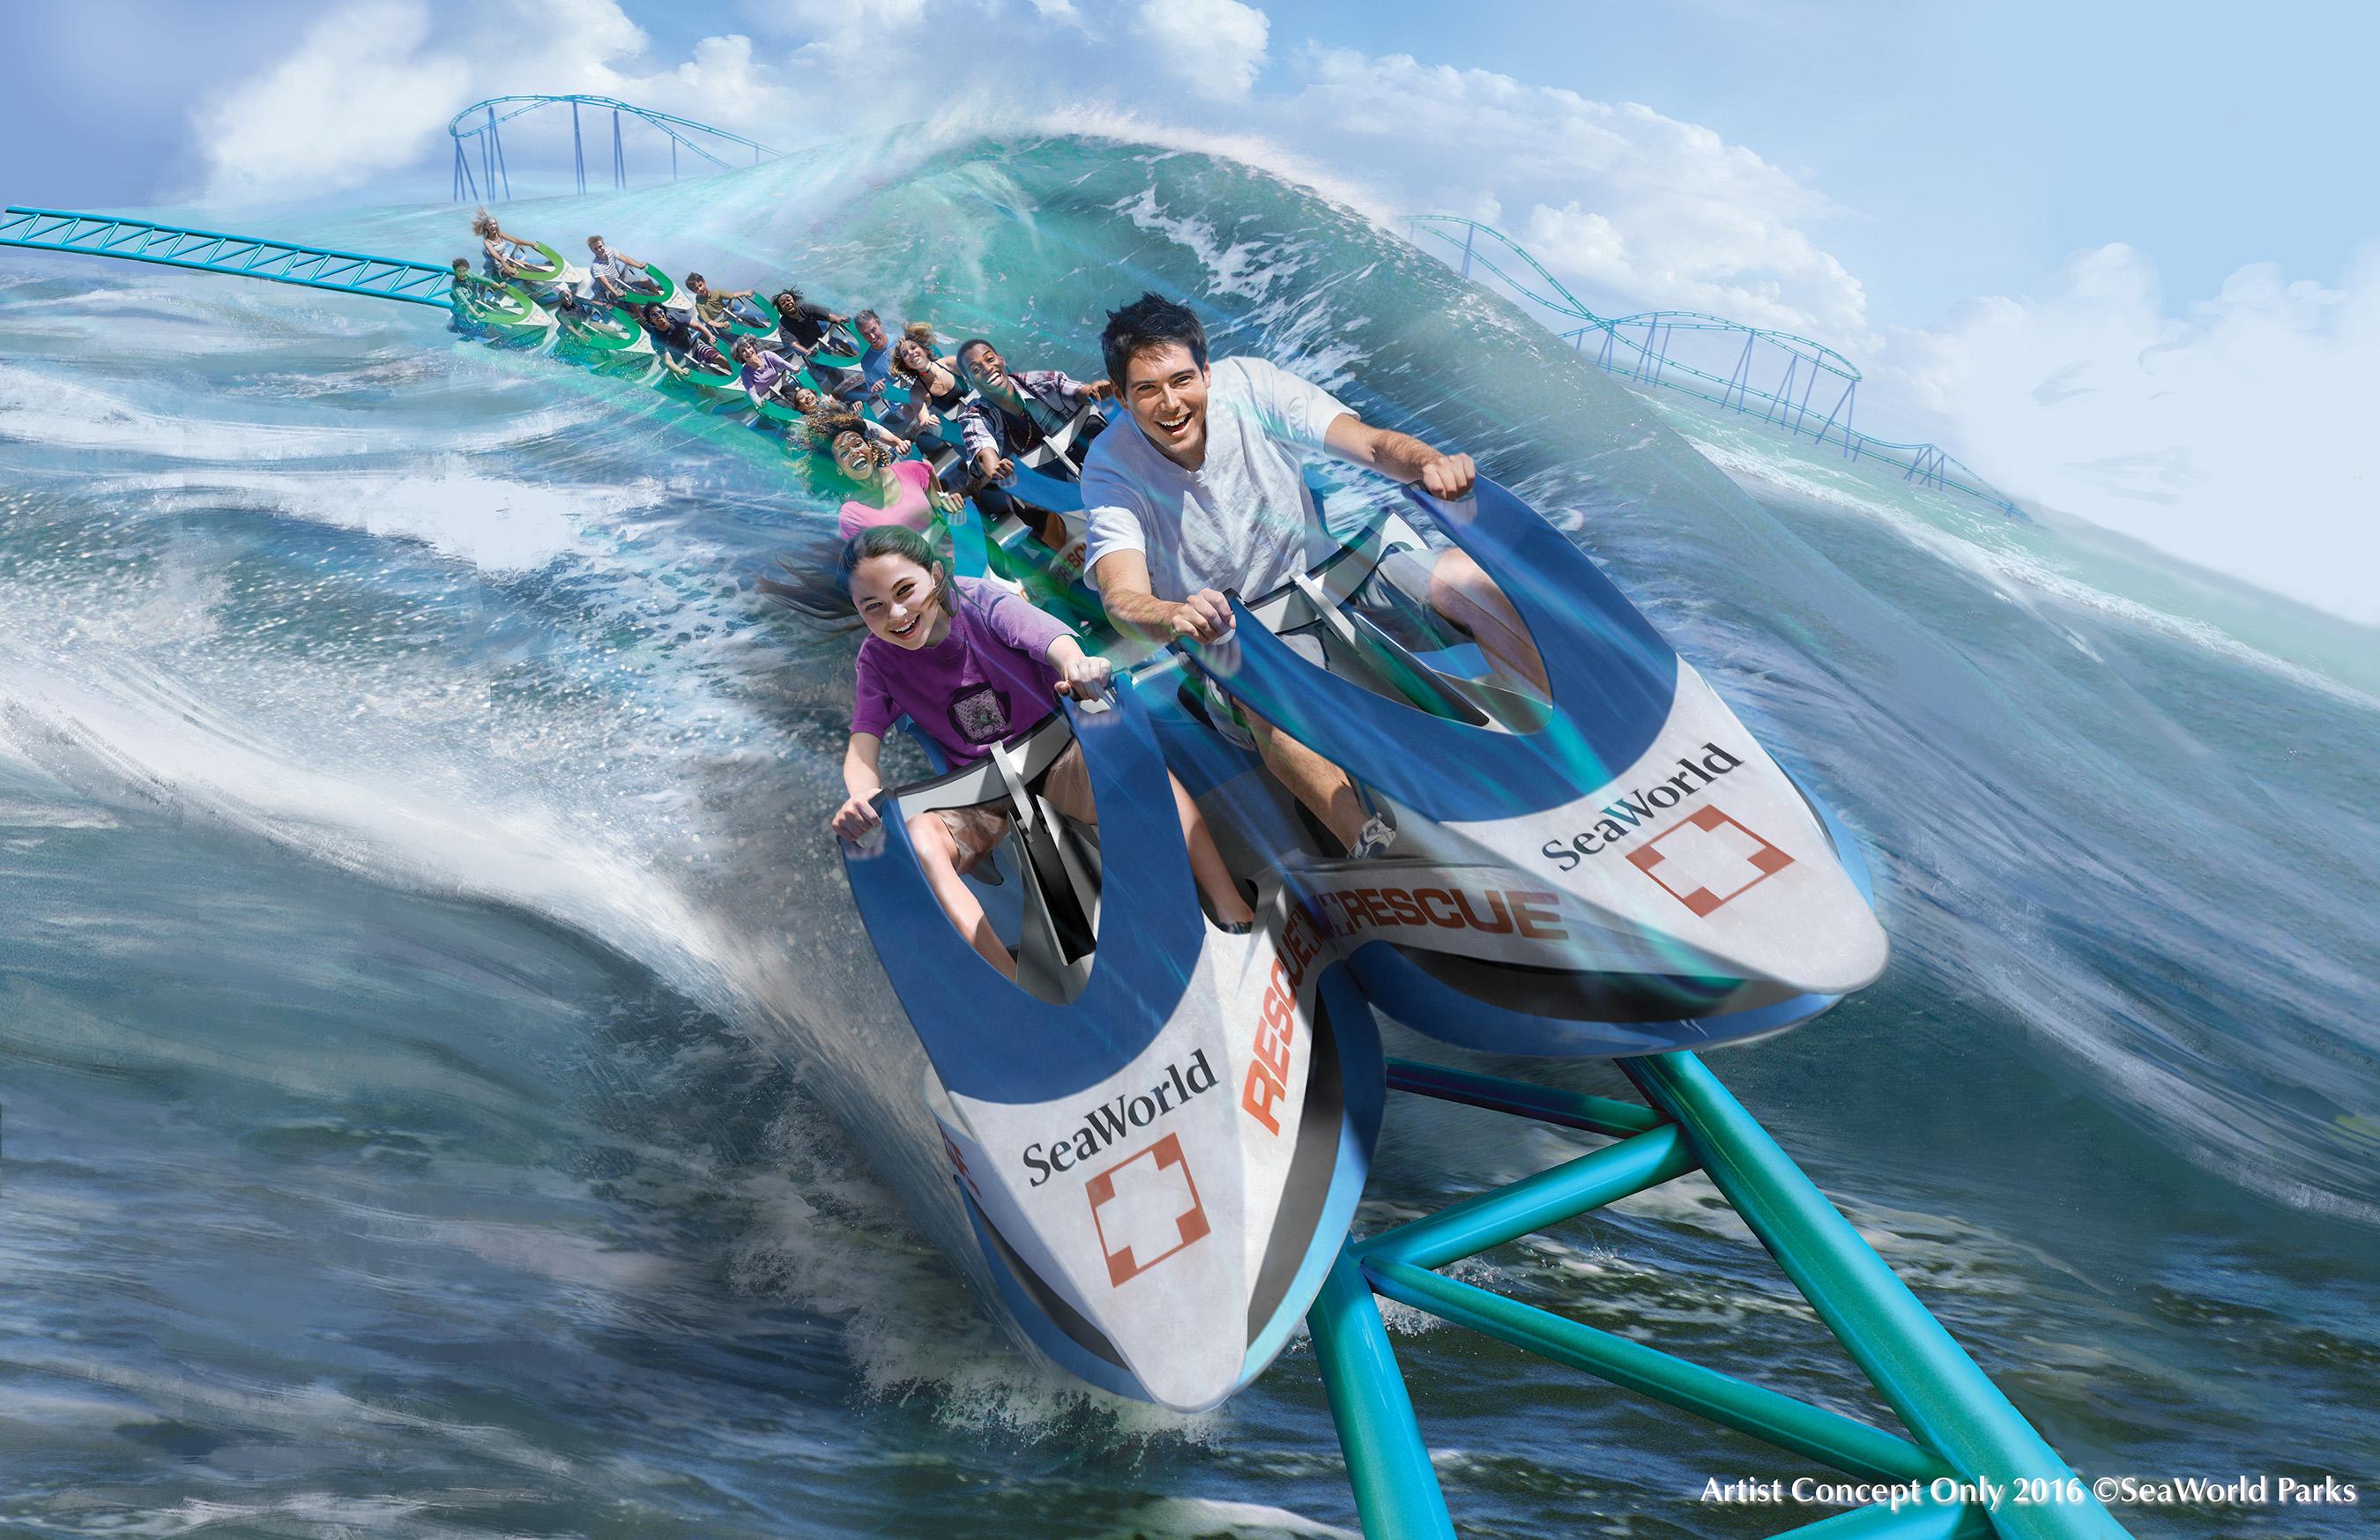 Concept art for a new coaster for SeaWorld San Antonio.